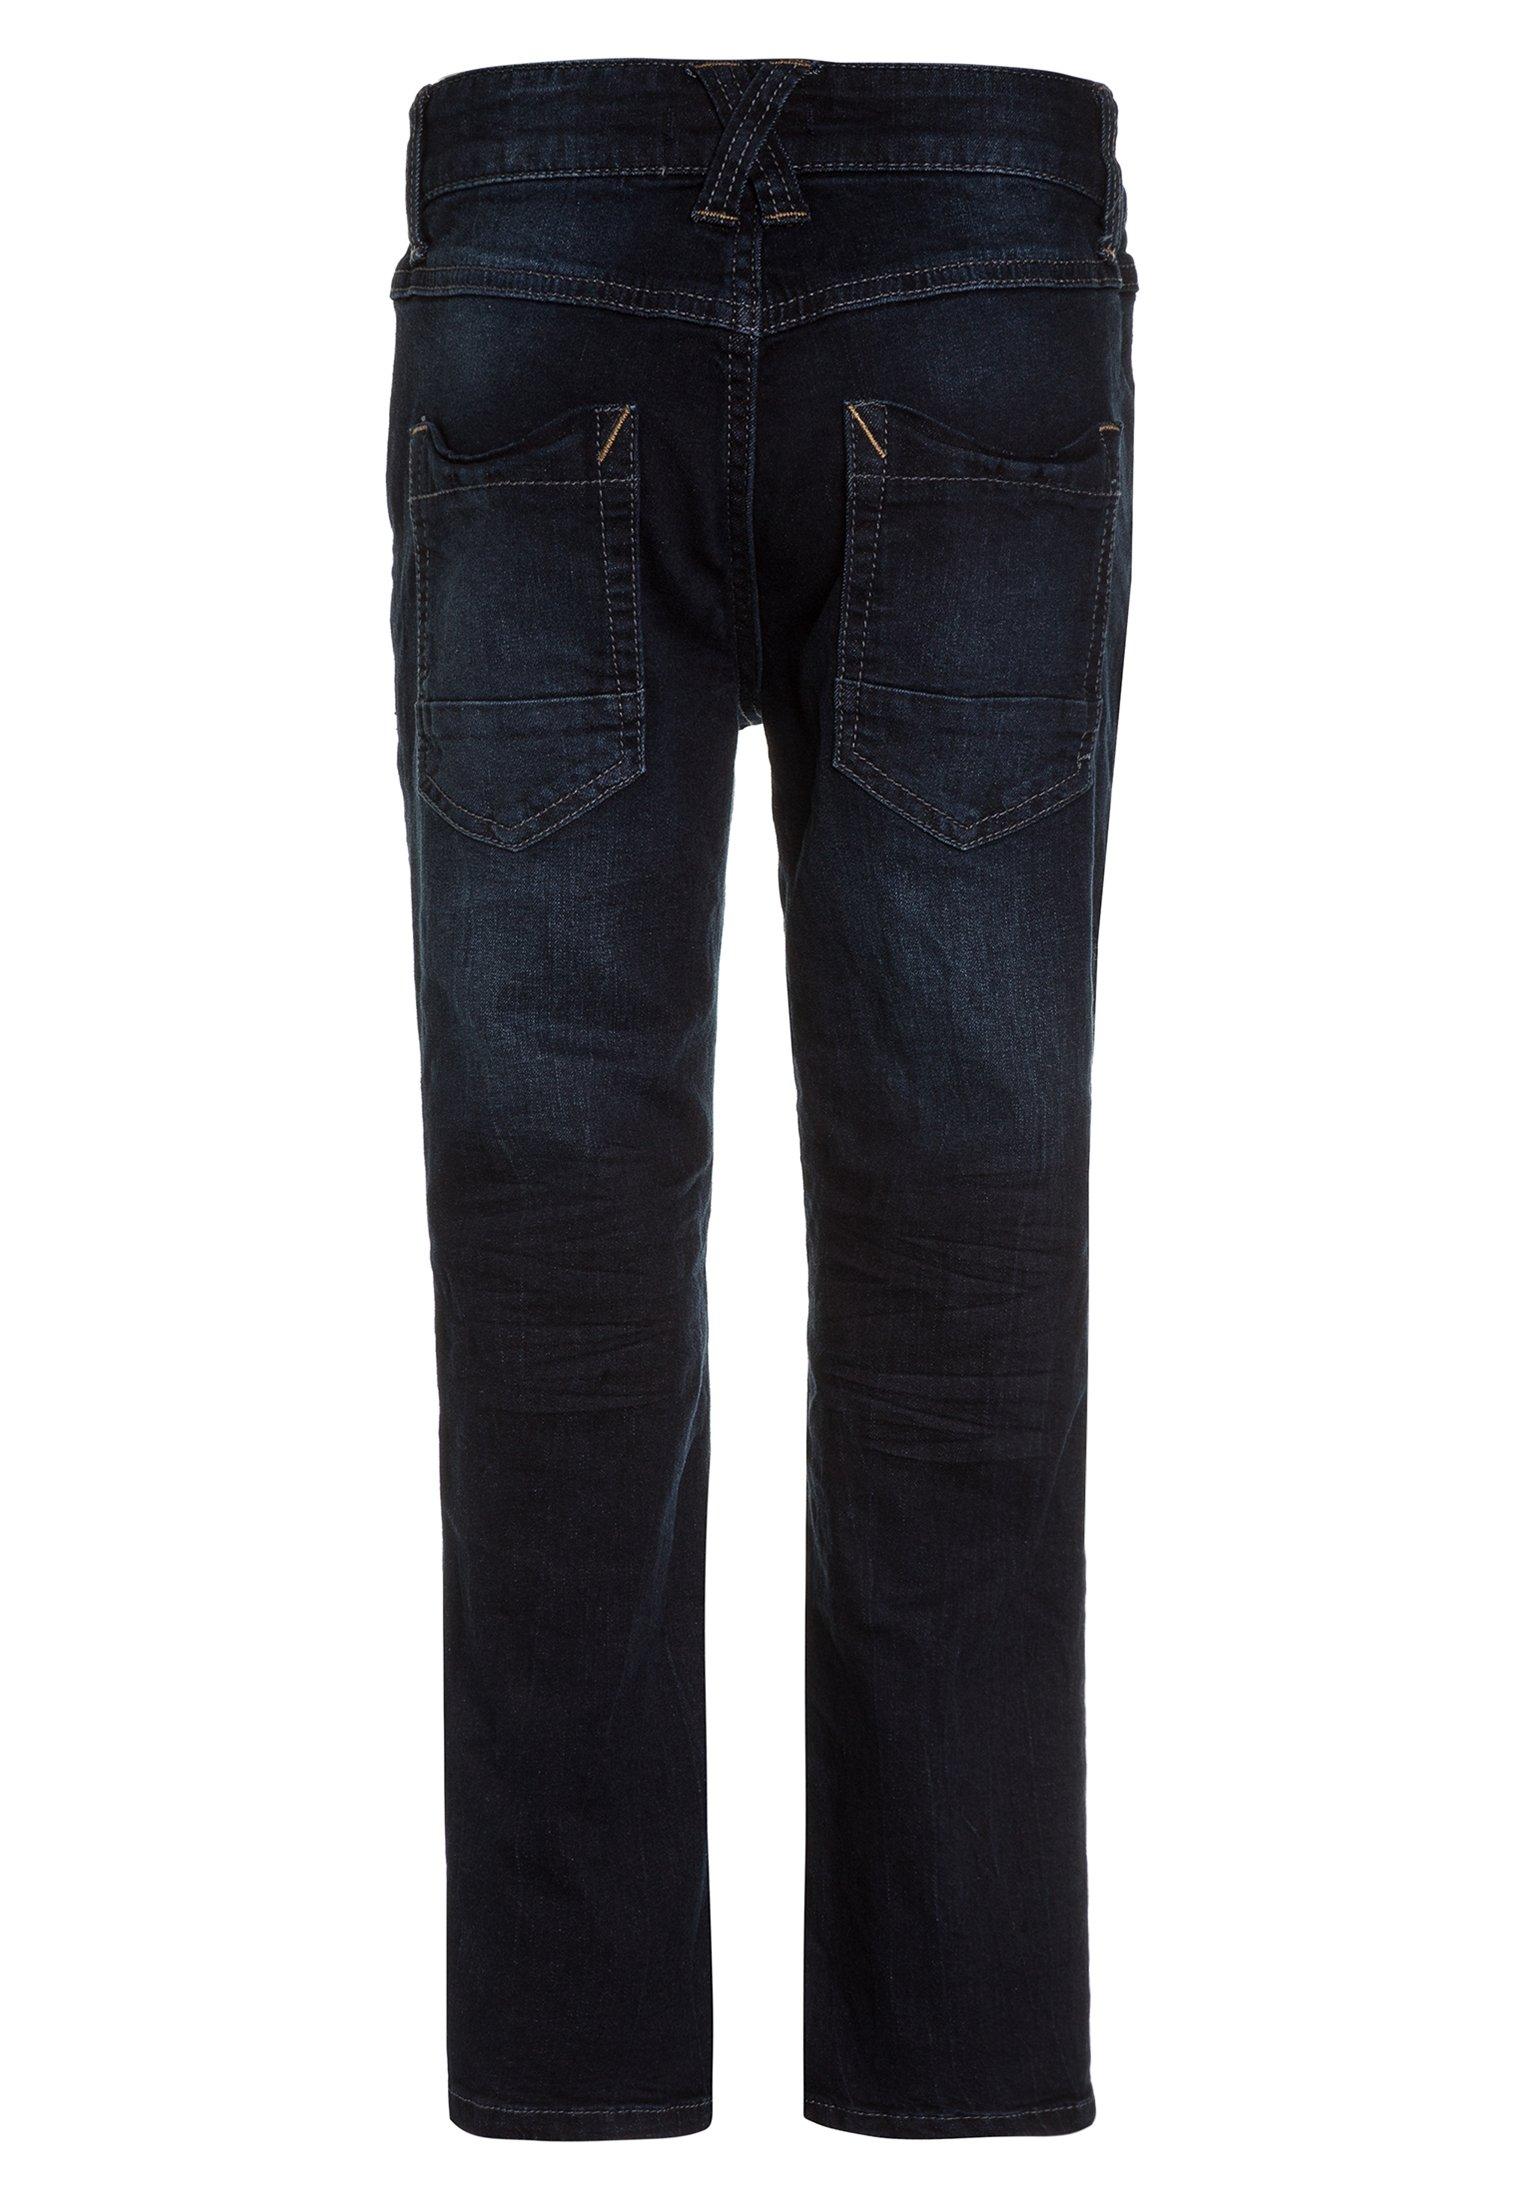 Kinder HOSE - Jeans Straight Leg - blue denim